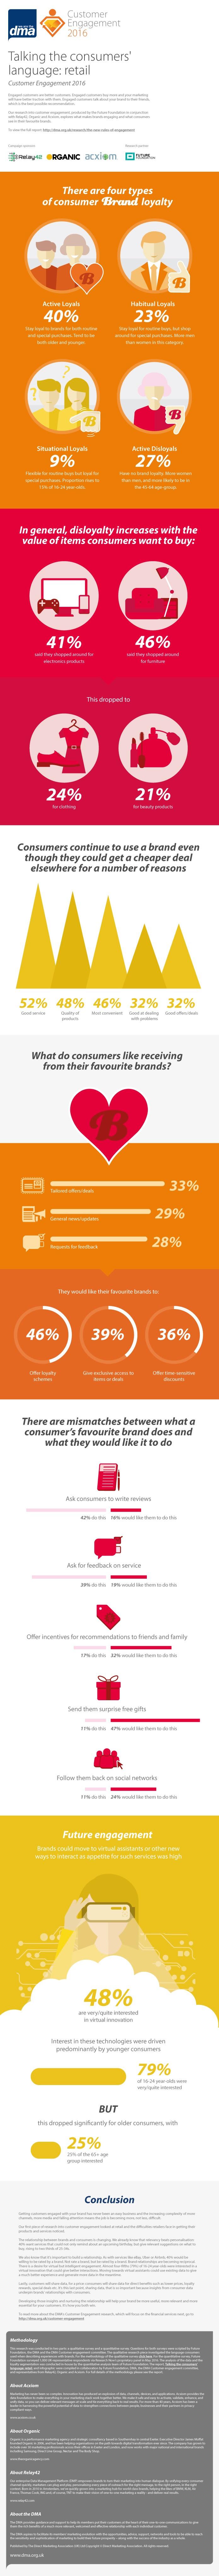 Customer-engagement-infographic-2016 - ONLINE